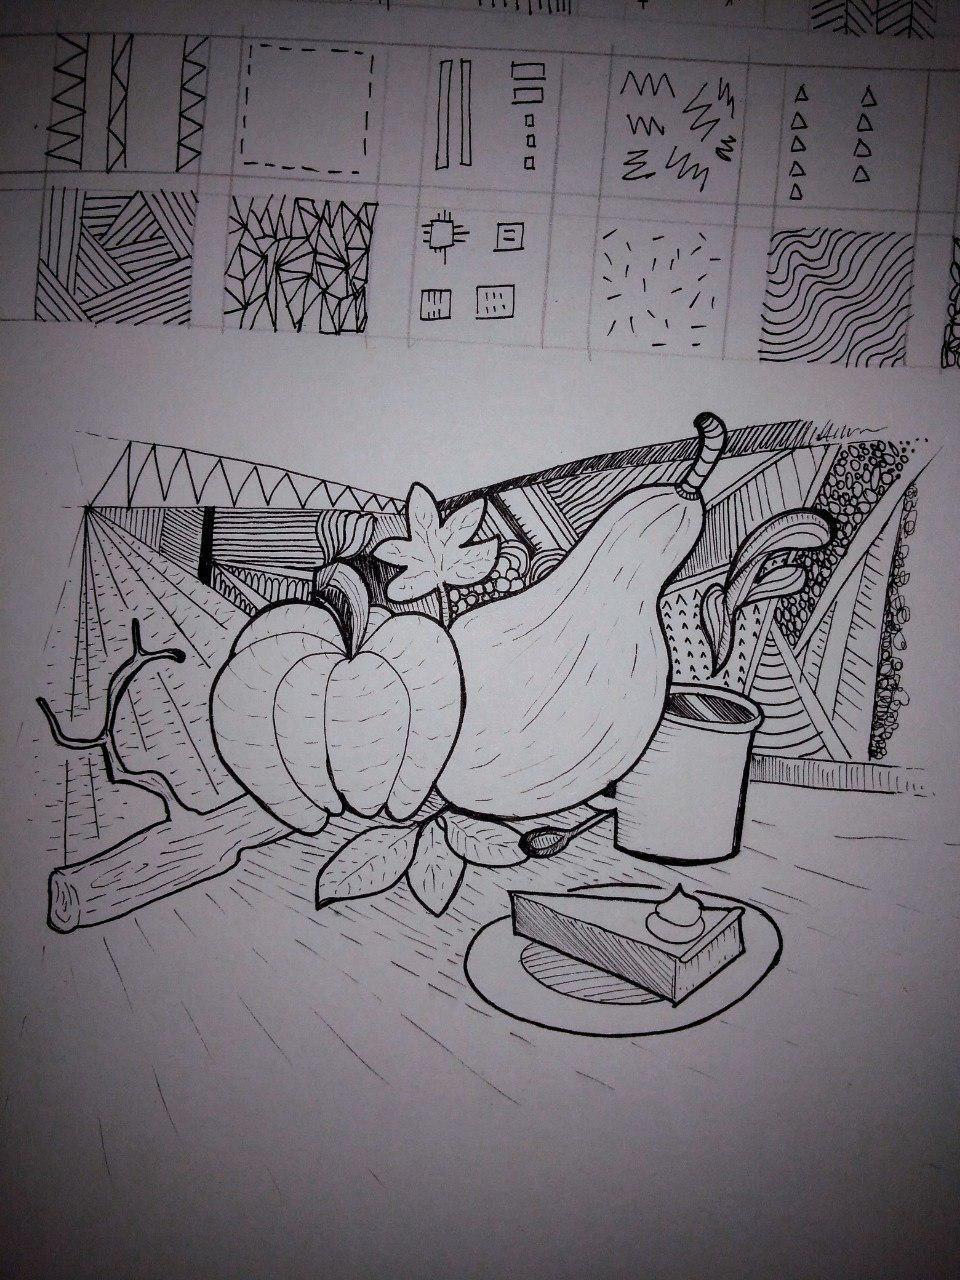 Autumn doodle - image 1 - student project